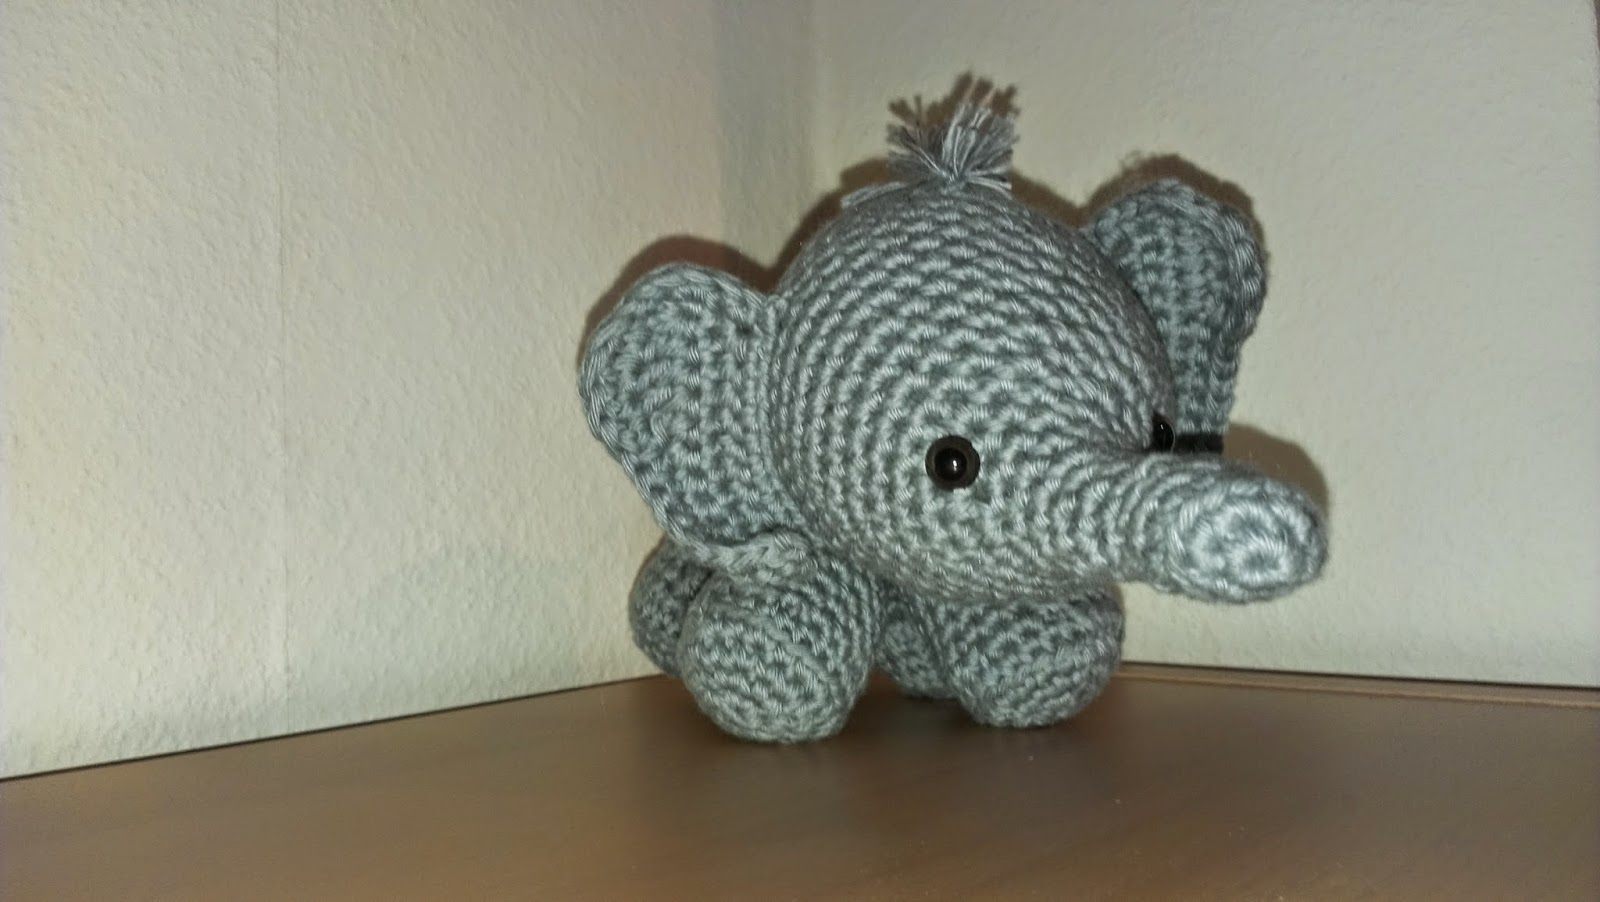 Amigurumi Xxl Elefant : Wundervolle Amigurumi Welt: Elefant